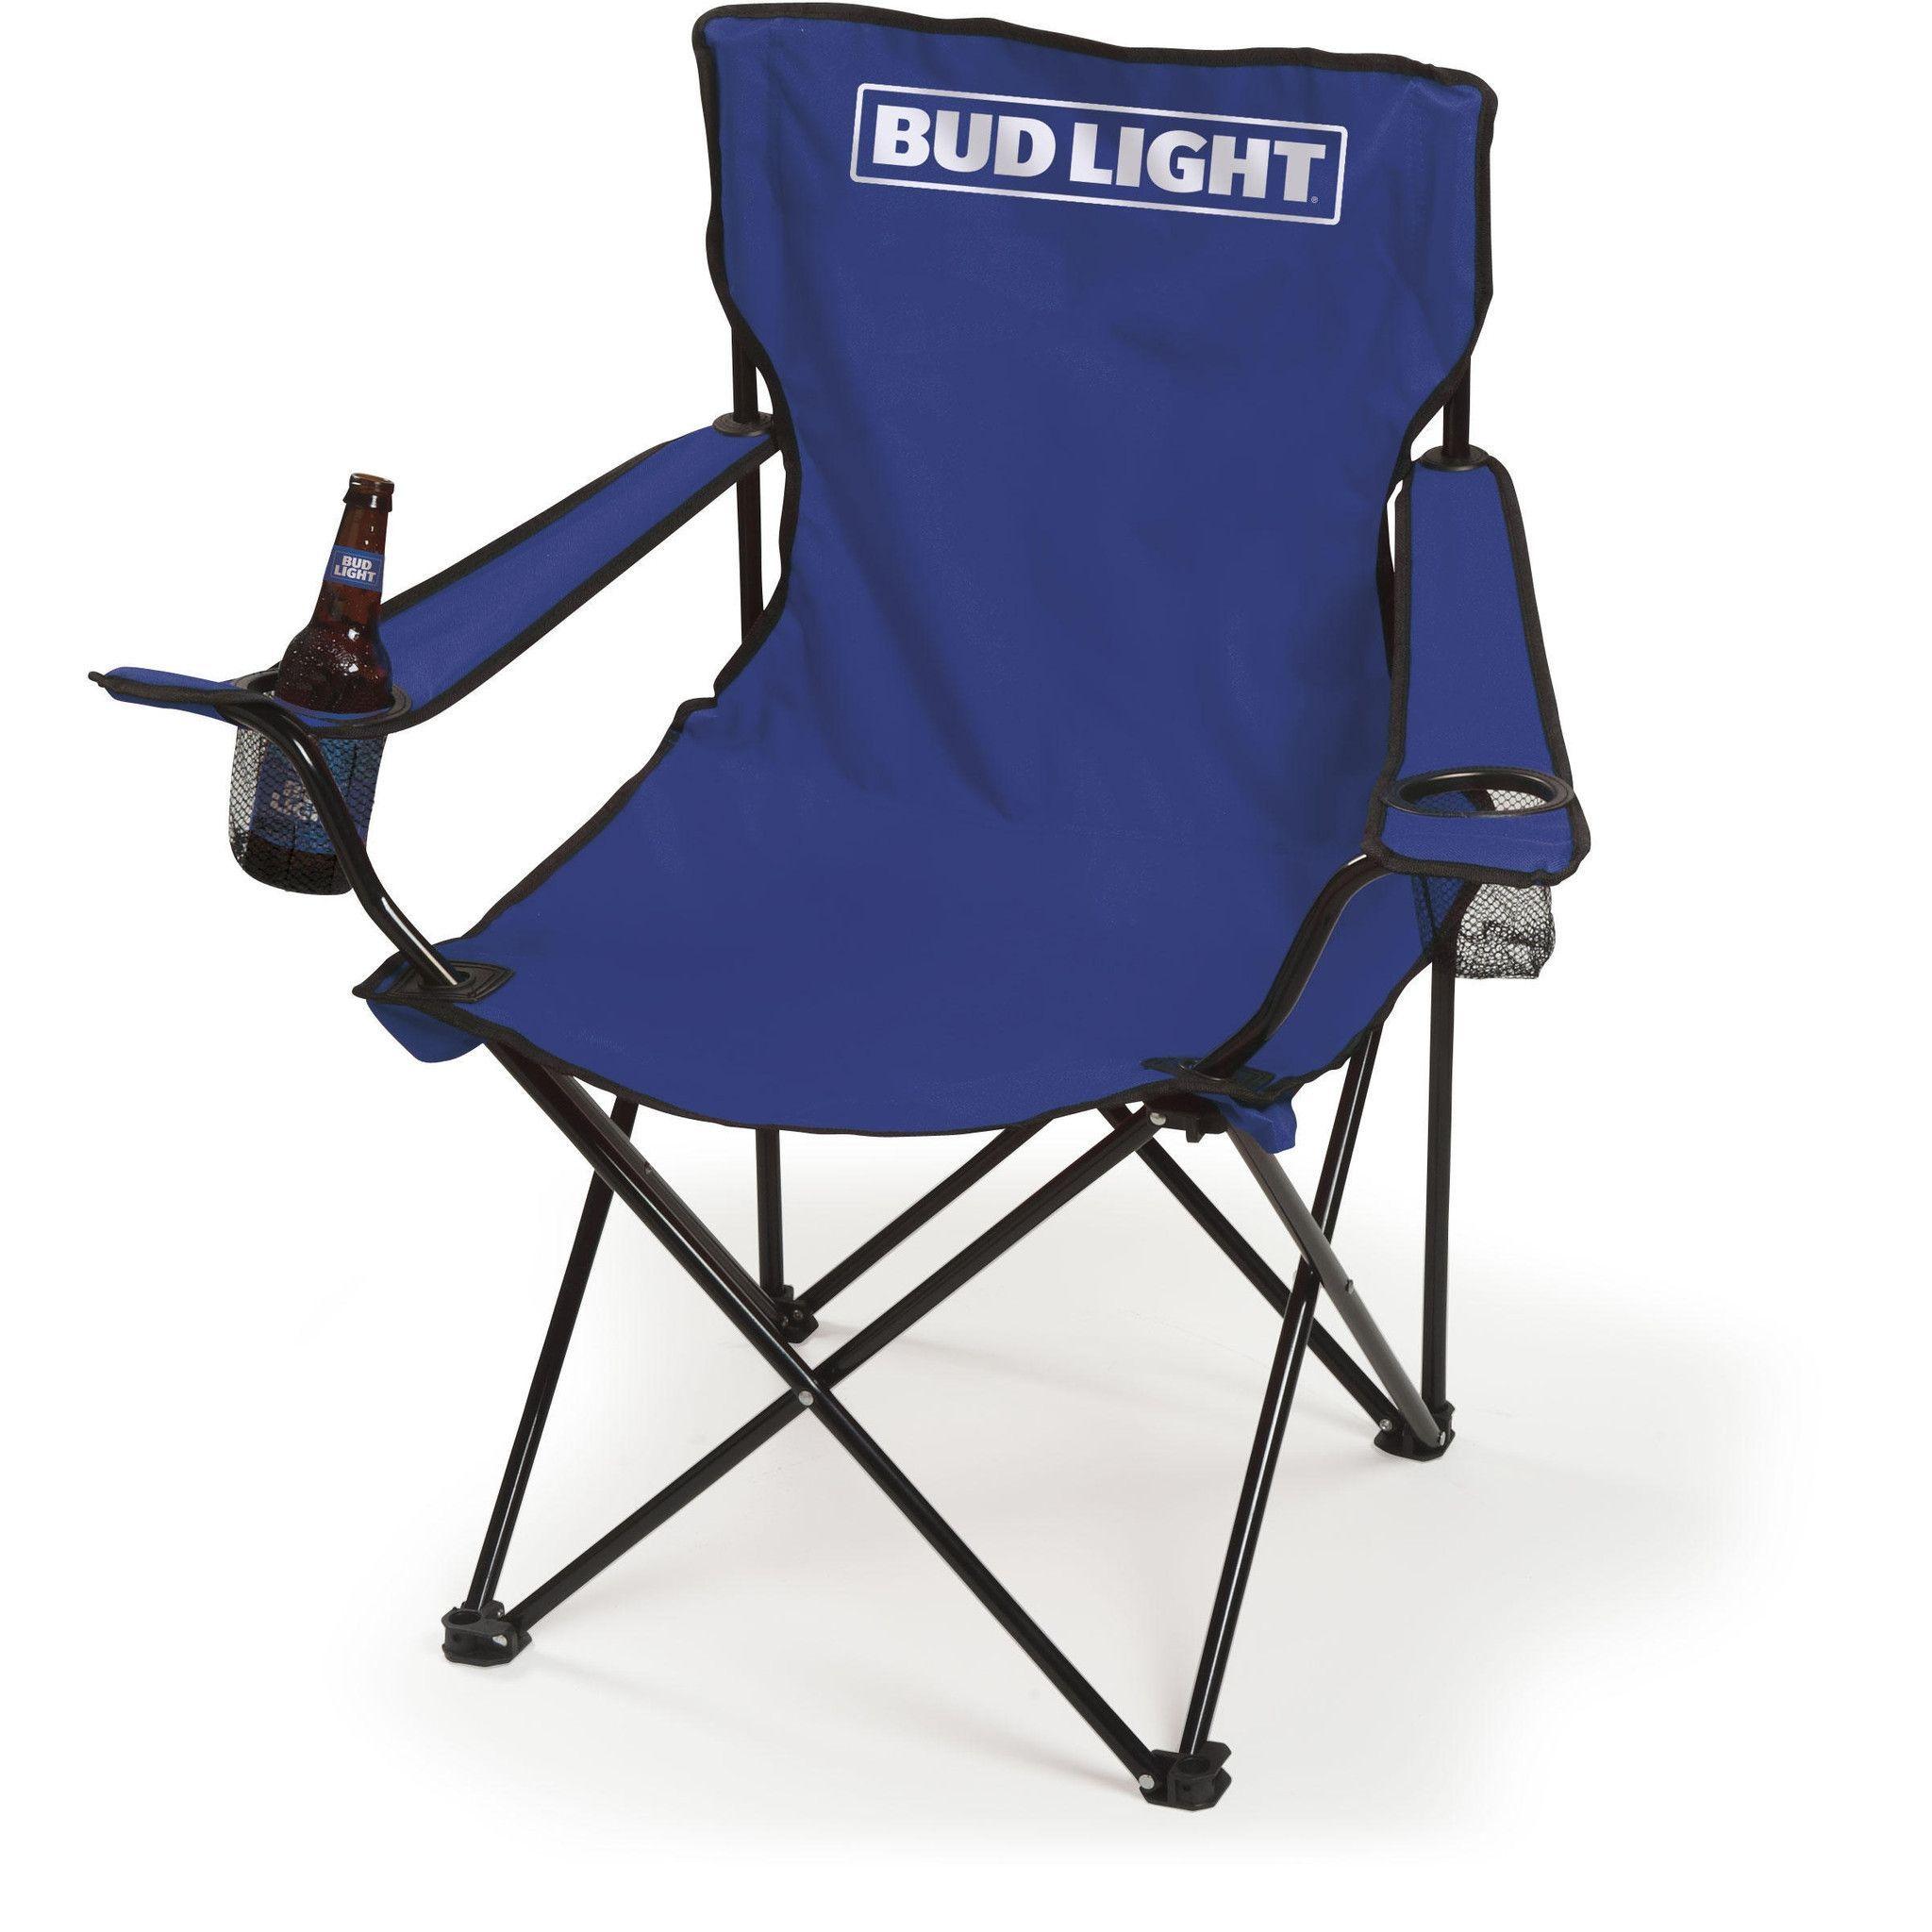 Enjoyable Bud Light Folding Bag Chair Chair Folding Chair Outdoor Inzonedesignstudio Interior Chair Design Inzonedesignstudiocom